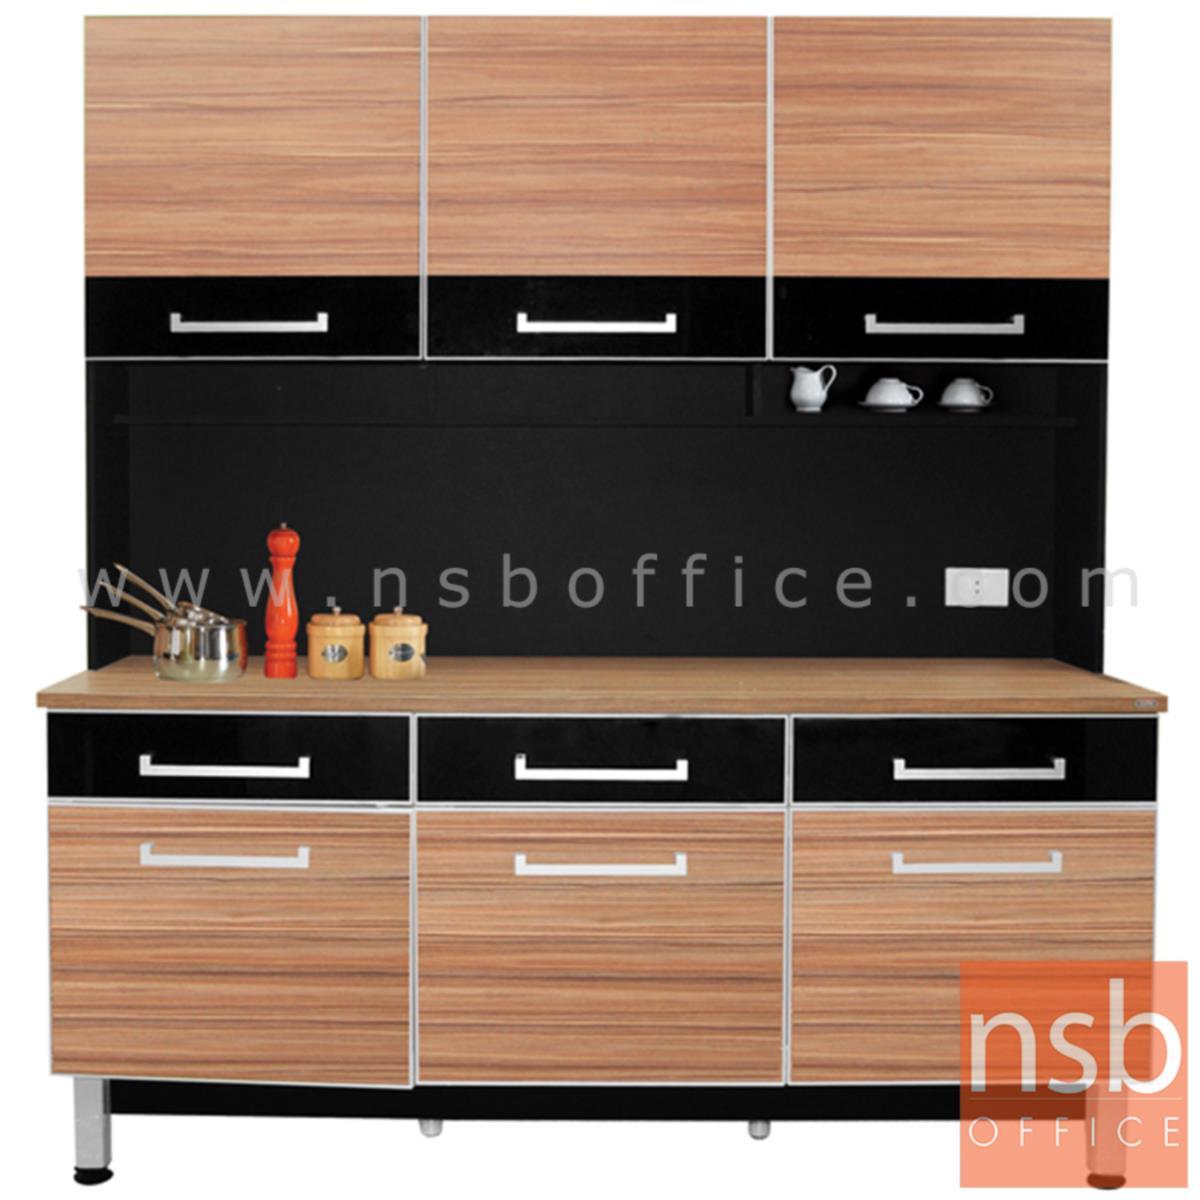 A33A016:ชุดตู้ครัวสูง ทันสมัย  รุ่น Minimus (มินิมัส)  ขนาด 180W cm. สีวอลนัทตัดกระจกชาดำ